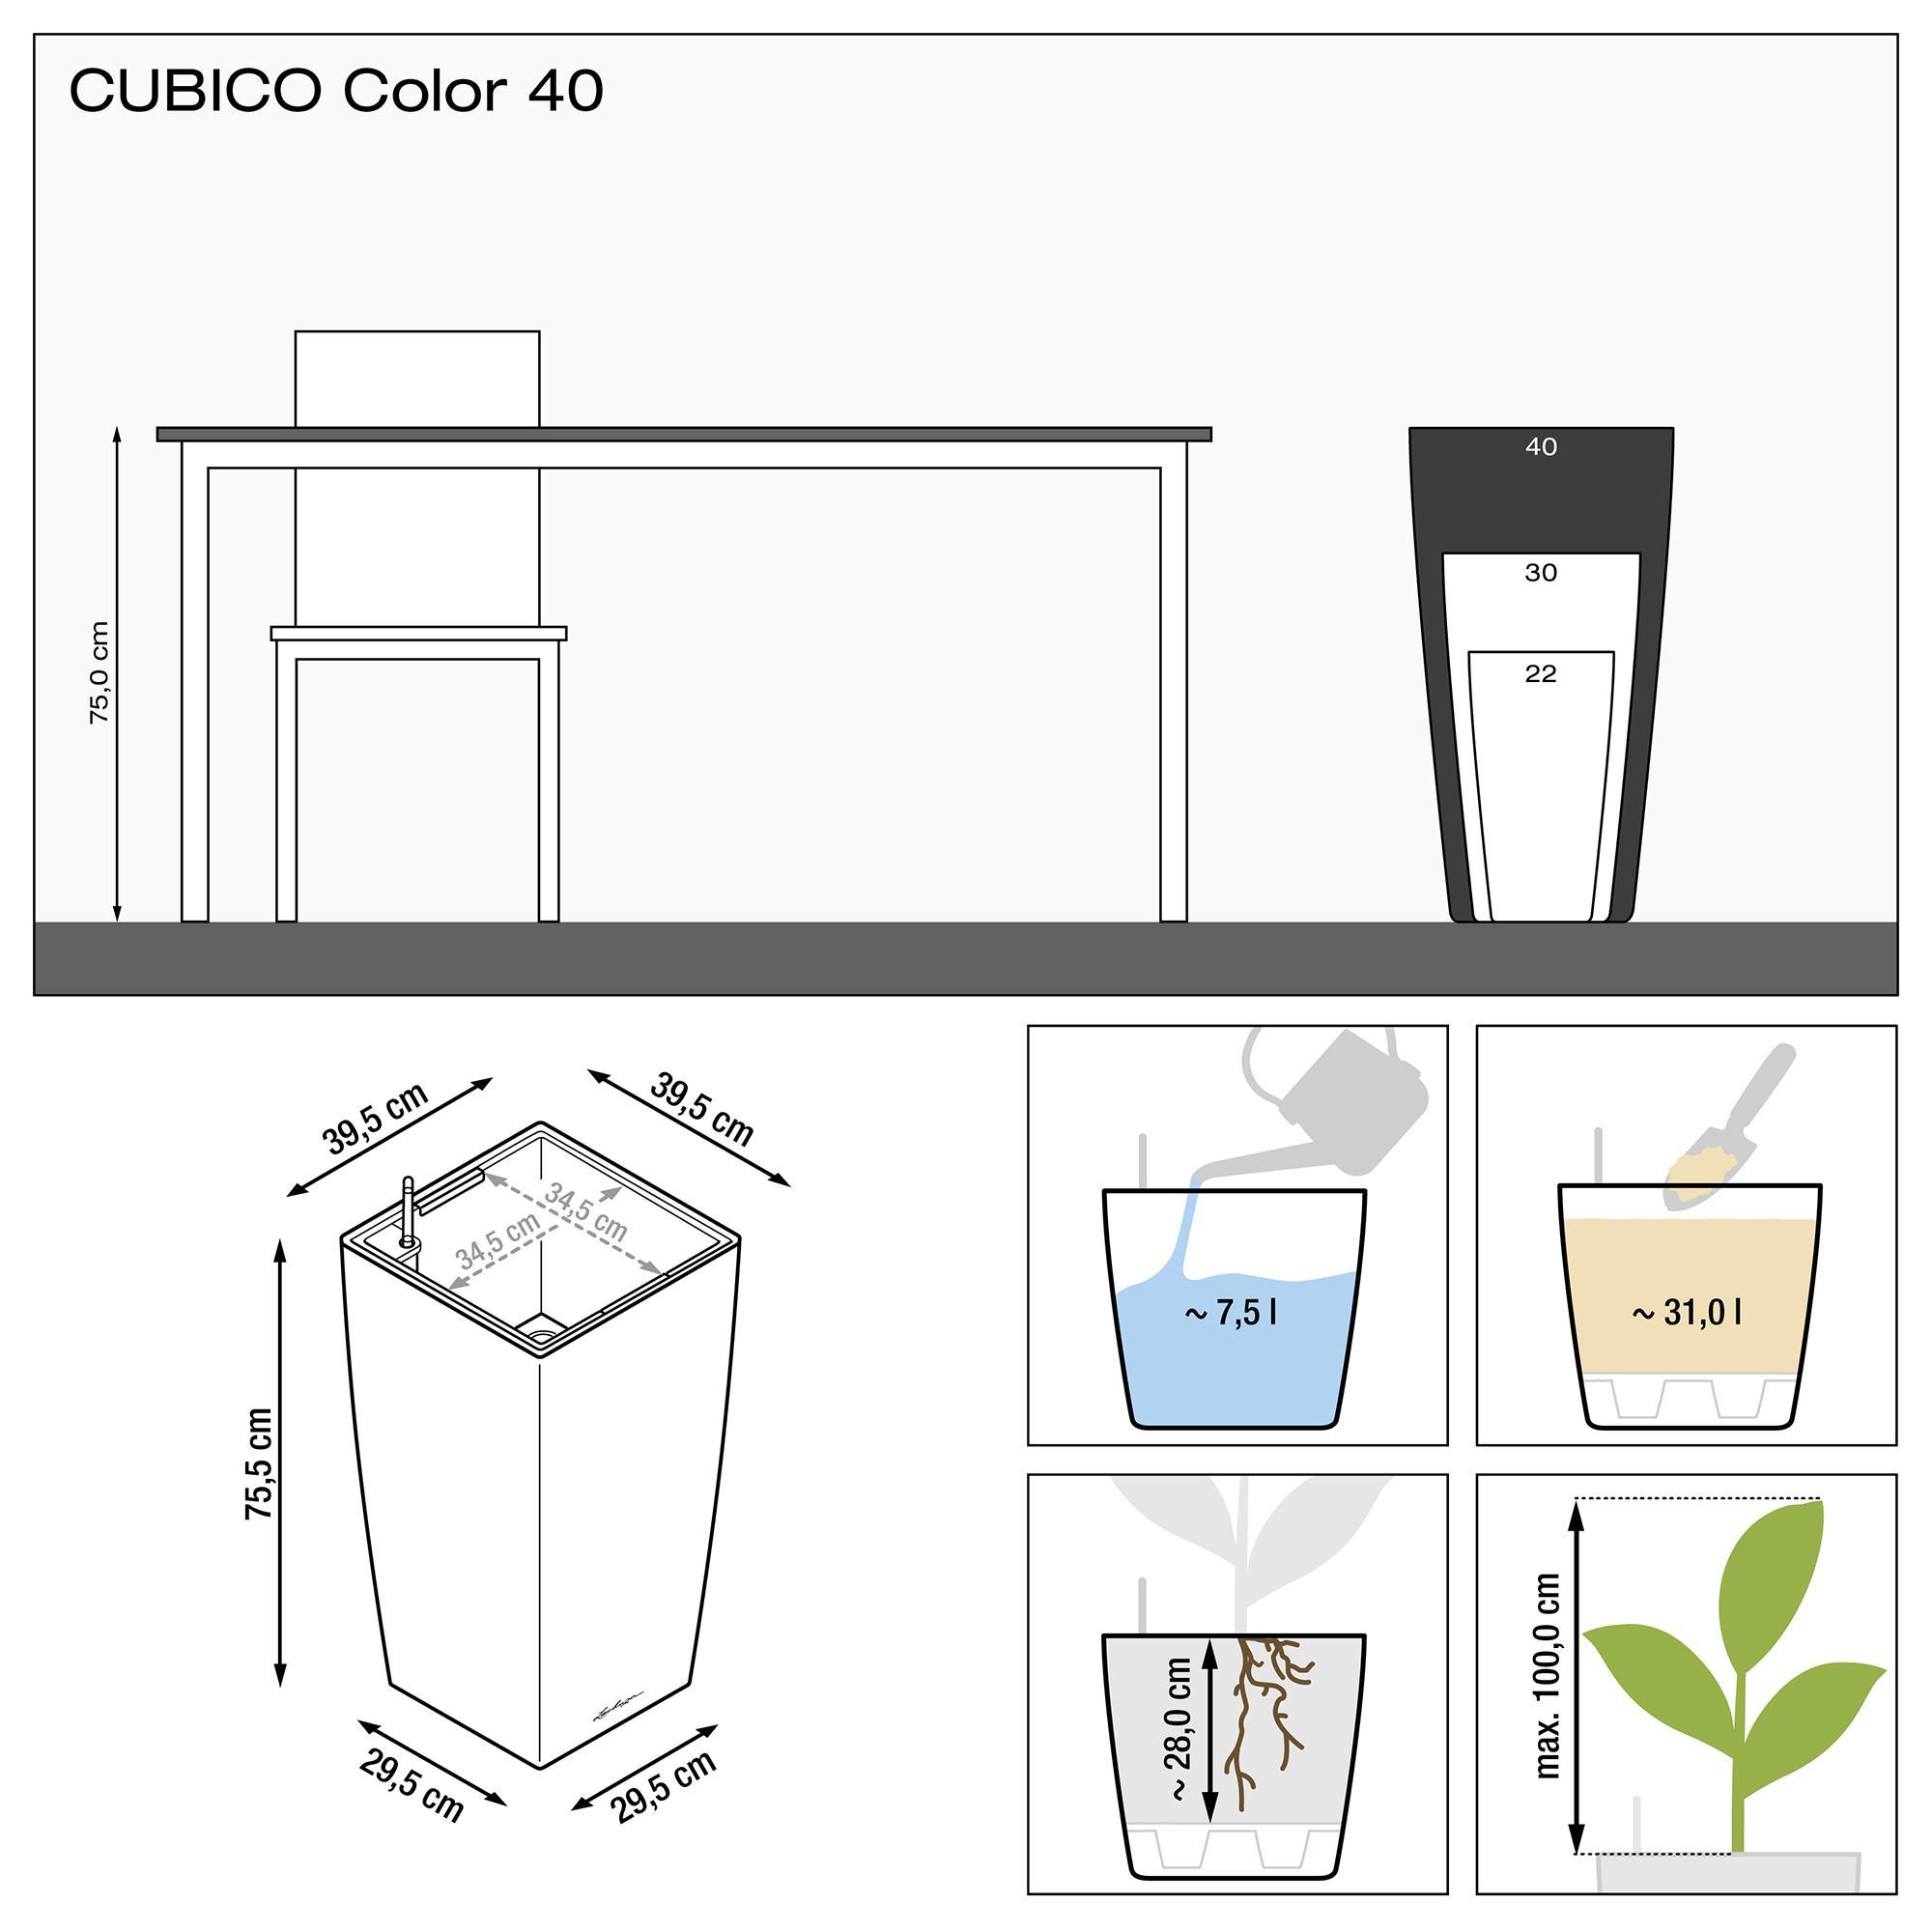 CUBICO Color 40 slate - Image 3